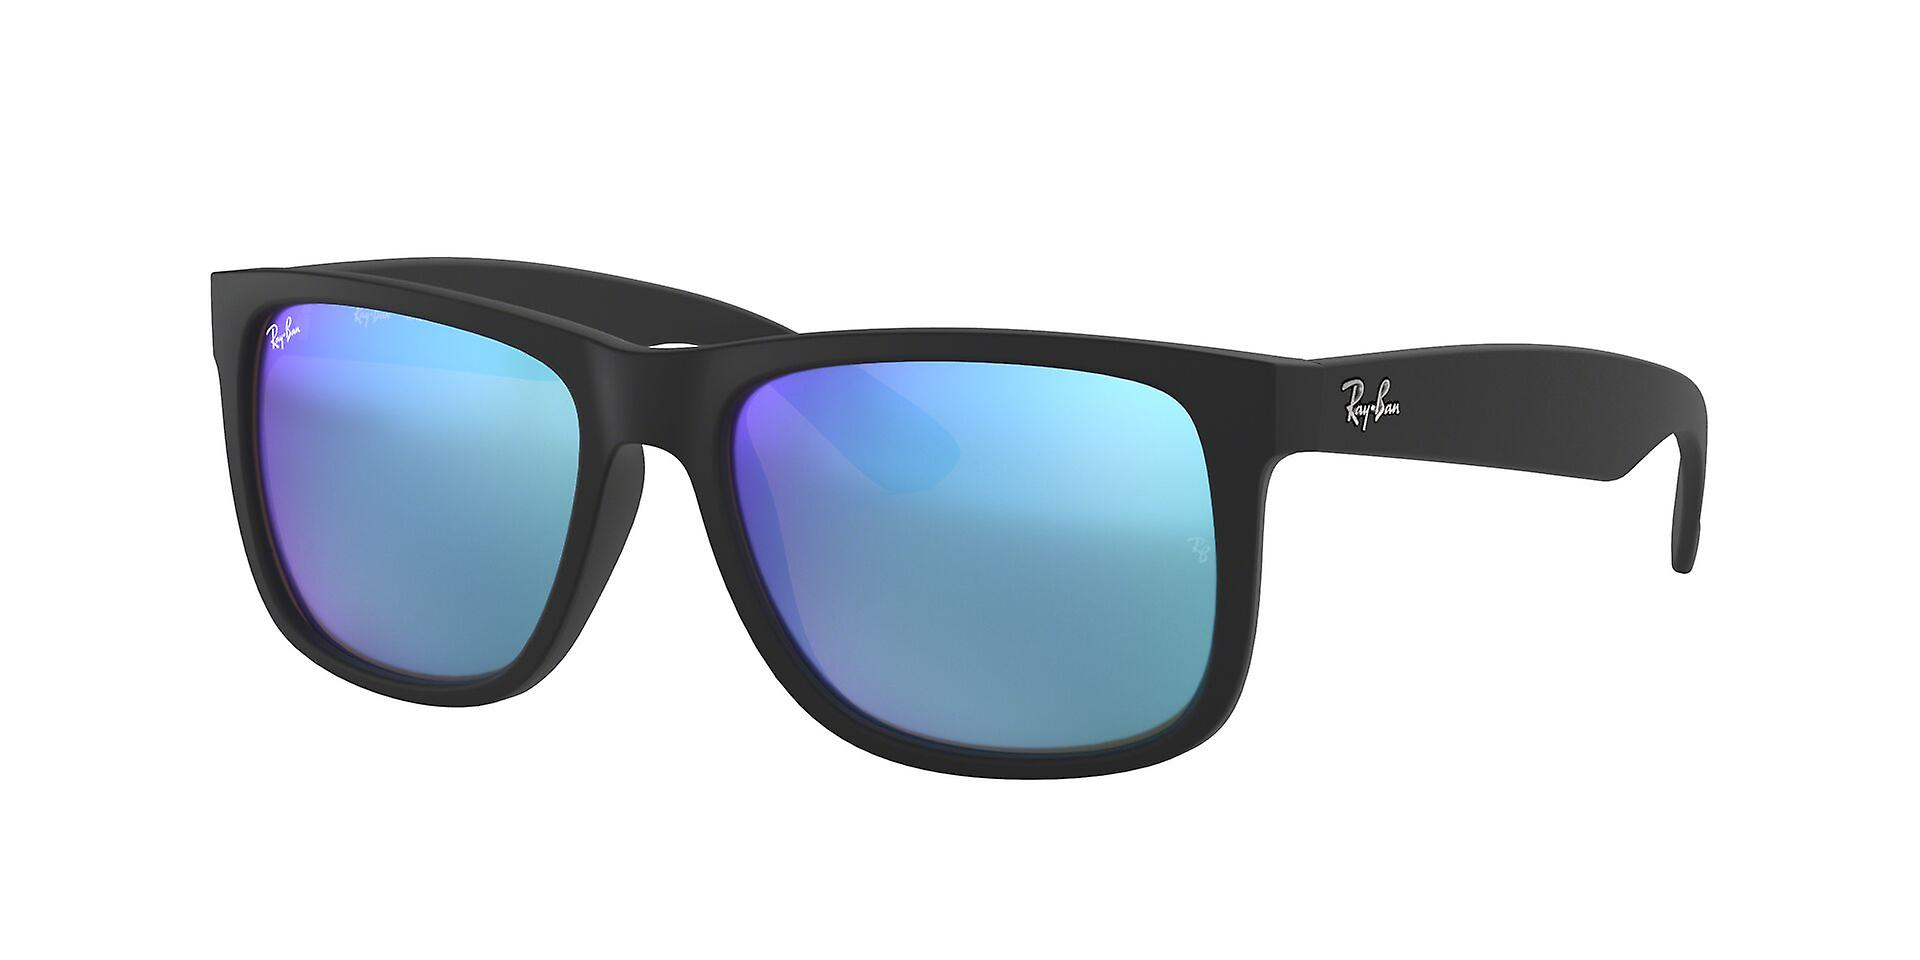 Ray-Ban Justin RB4165 622/55 Black Rubber/Green Mirror Blue Sunglasses